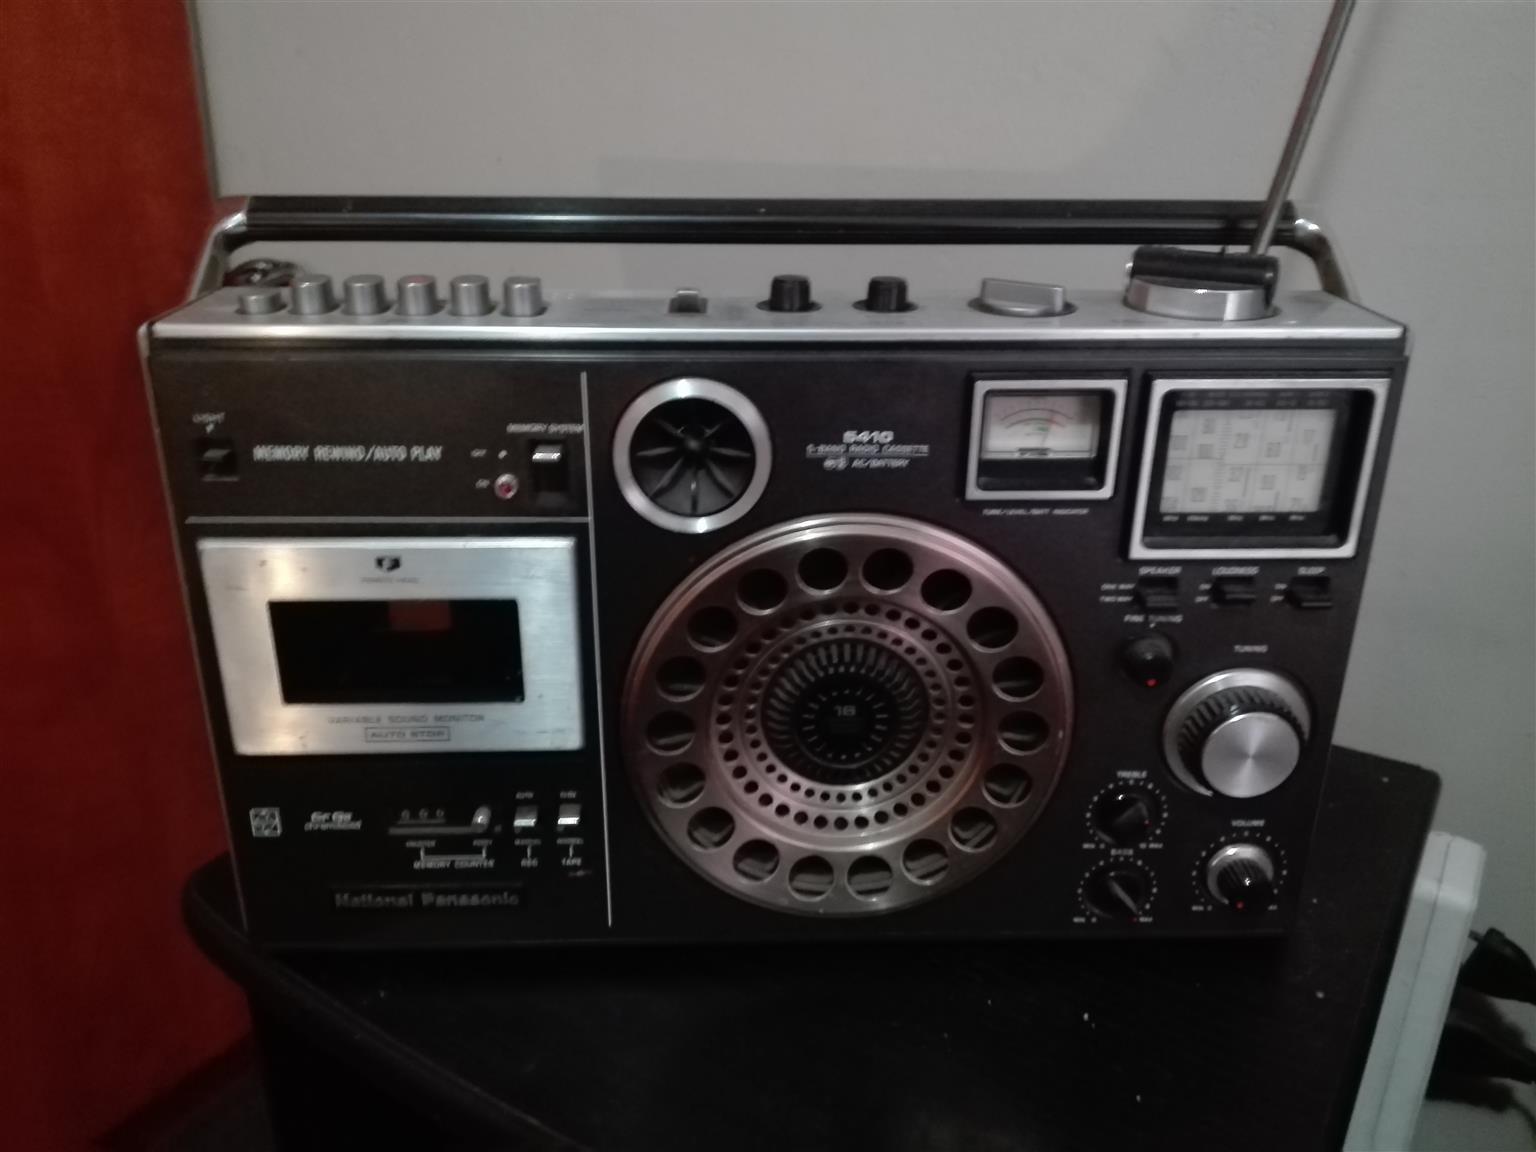 National Panasonic cassette radio - R5410